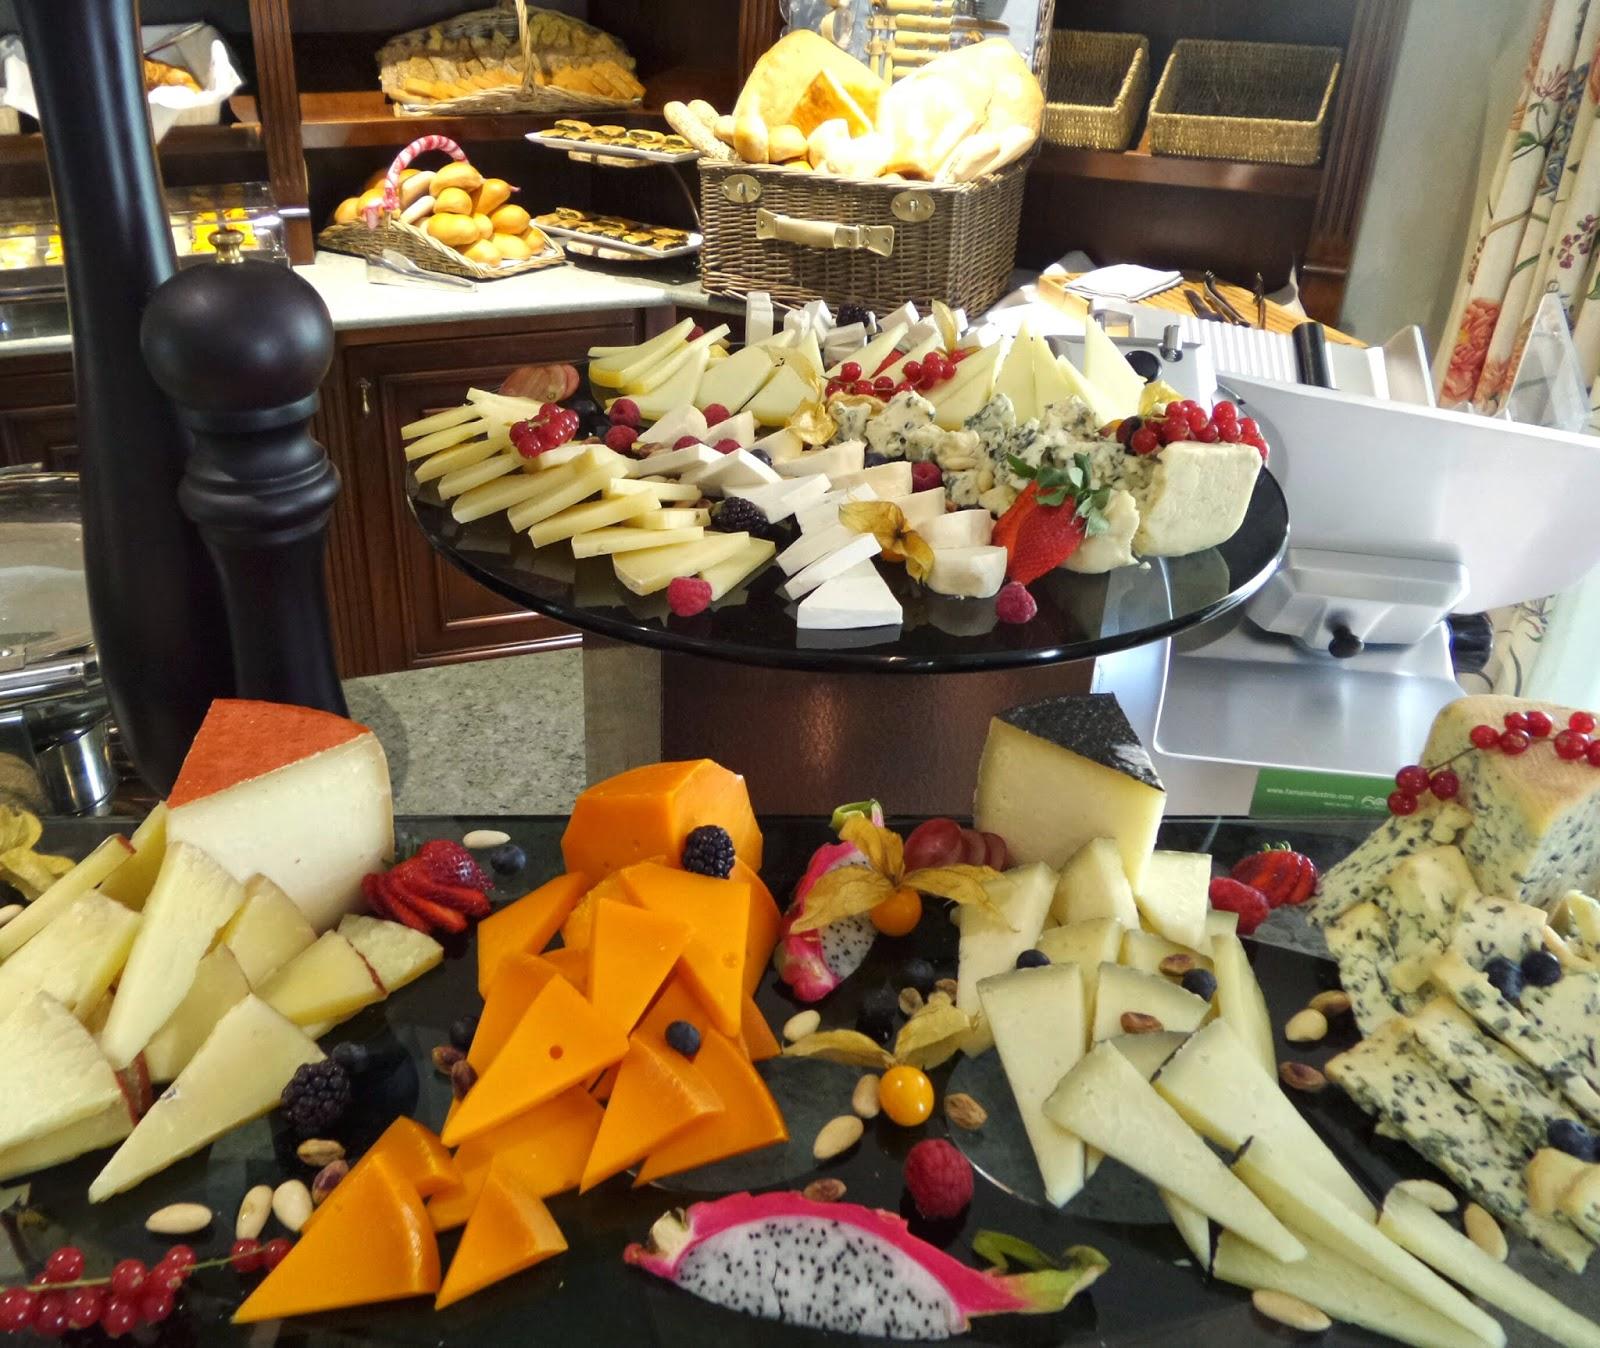 Sunday Brunch & Spa - Hotel Ville sull'Arno - Firenze